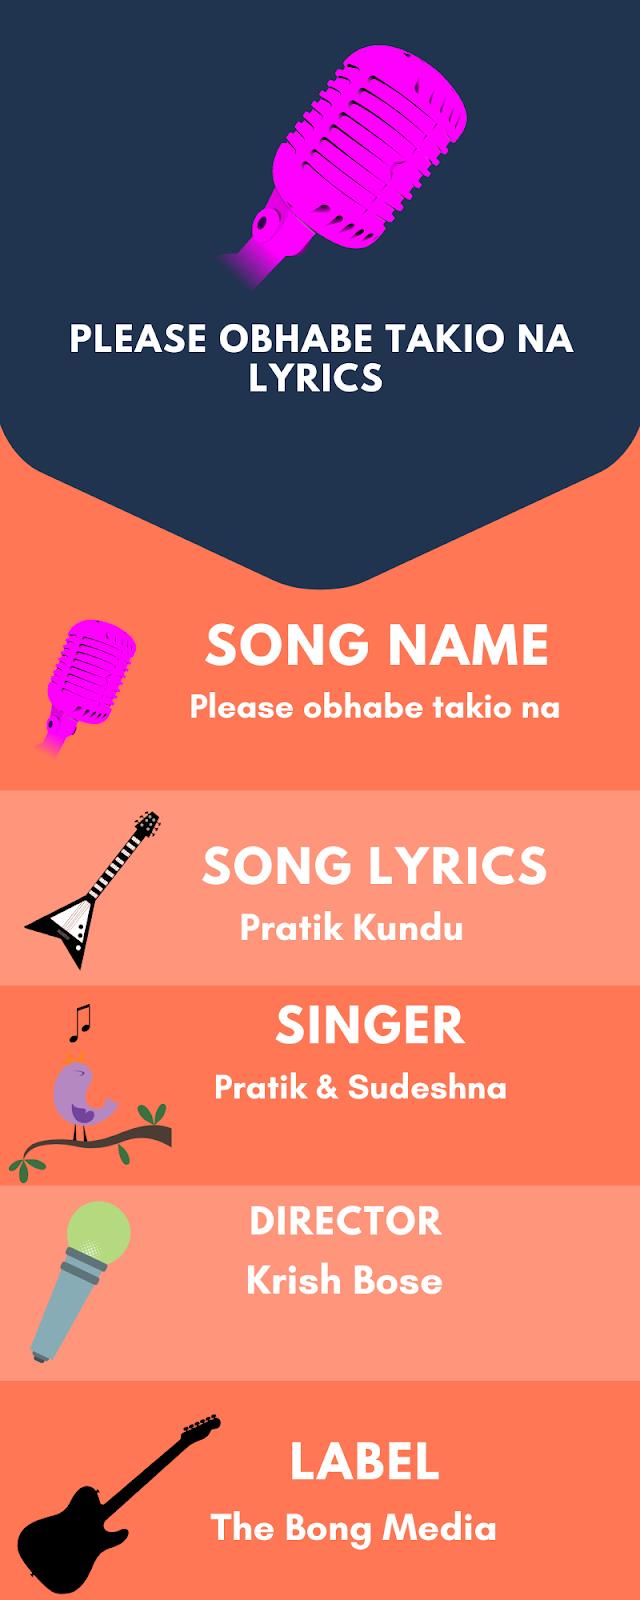 Please obhabe takio na lyrics